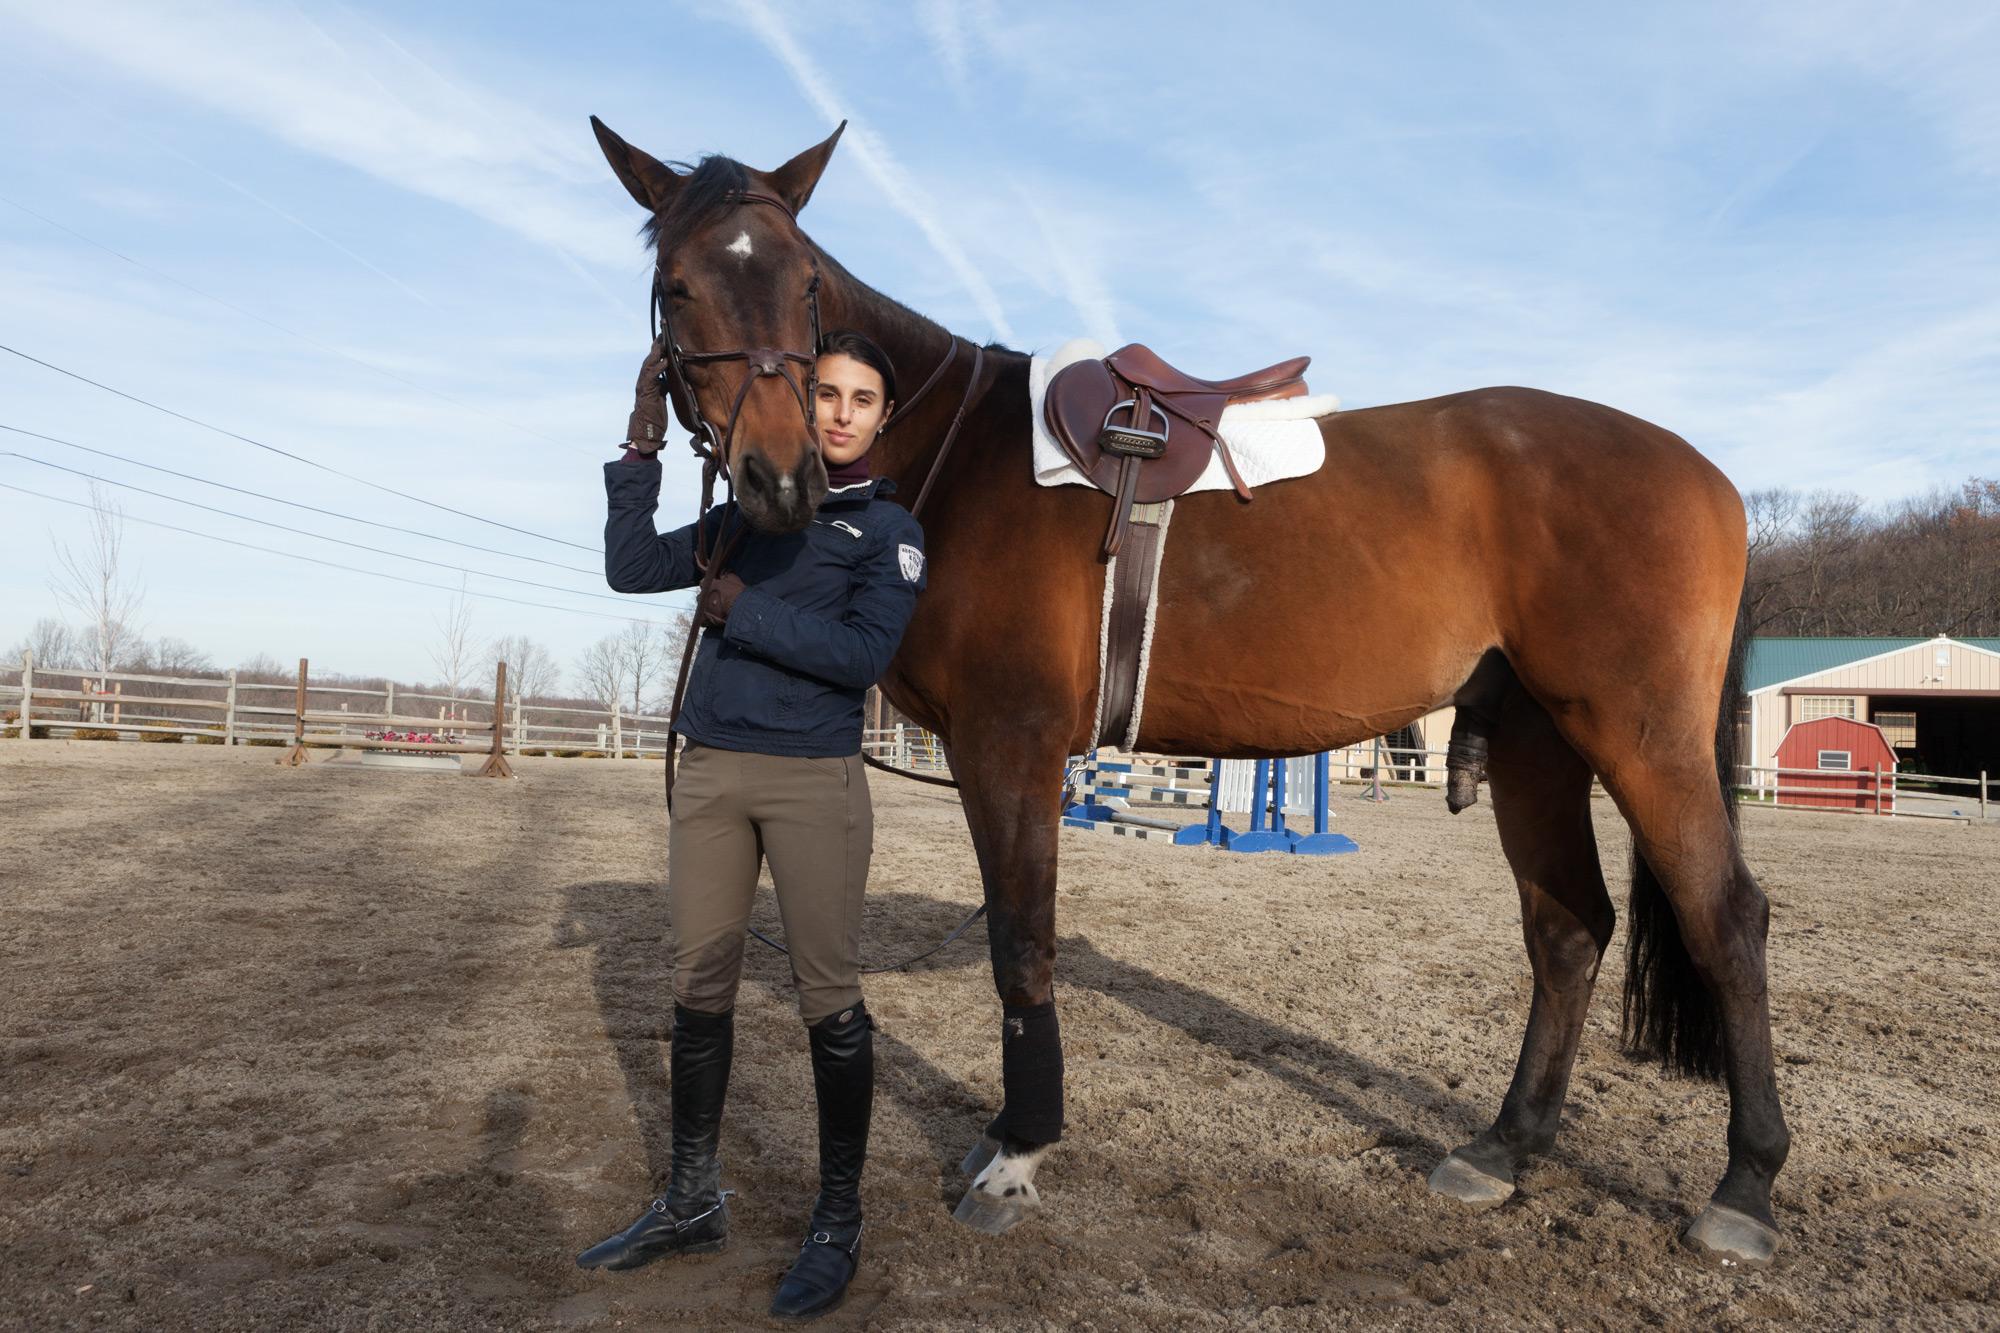 CareyKirkella-111119_Annabel_Horses_0719-2.jpg